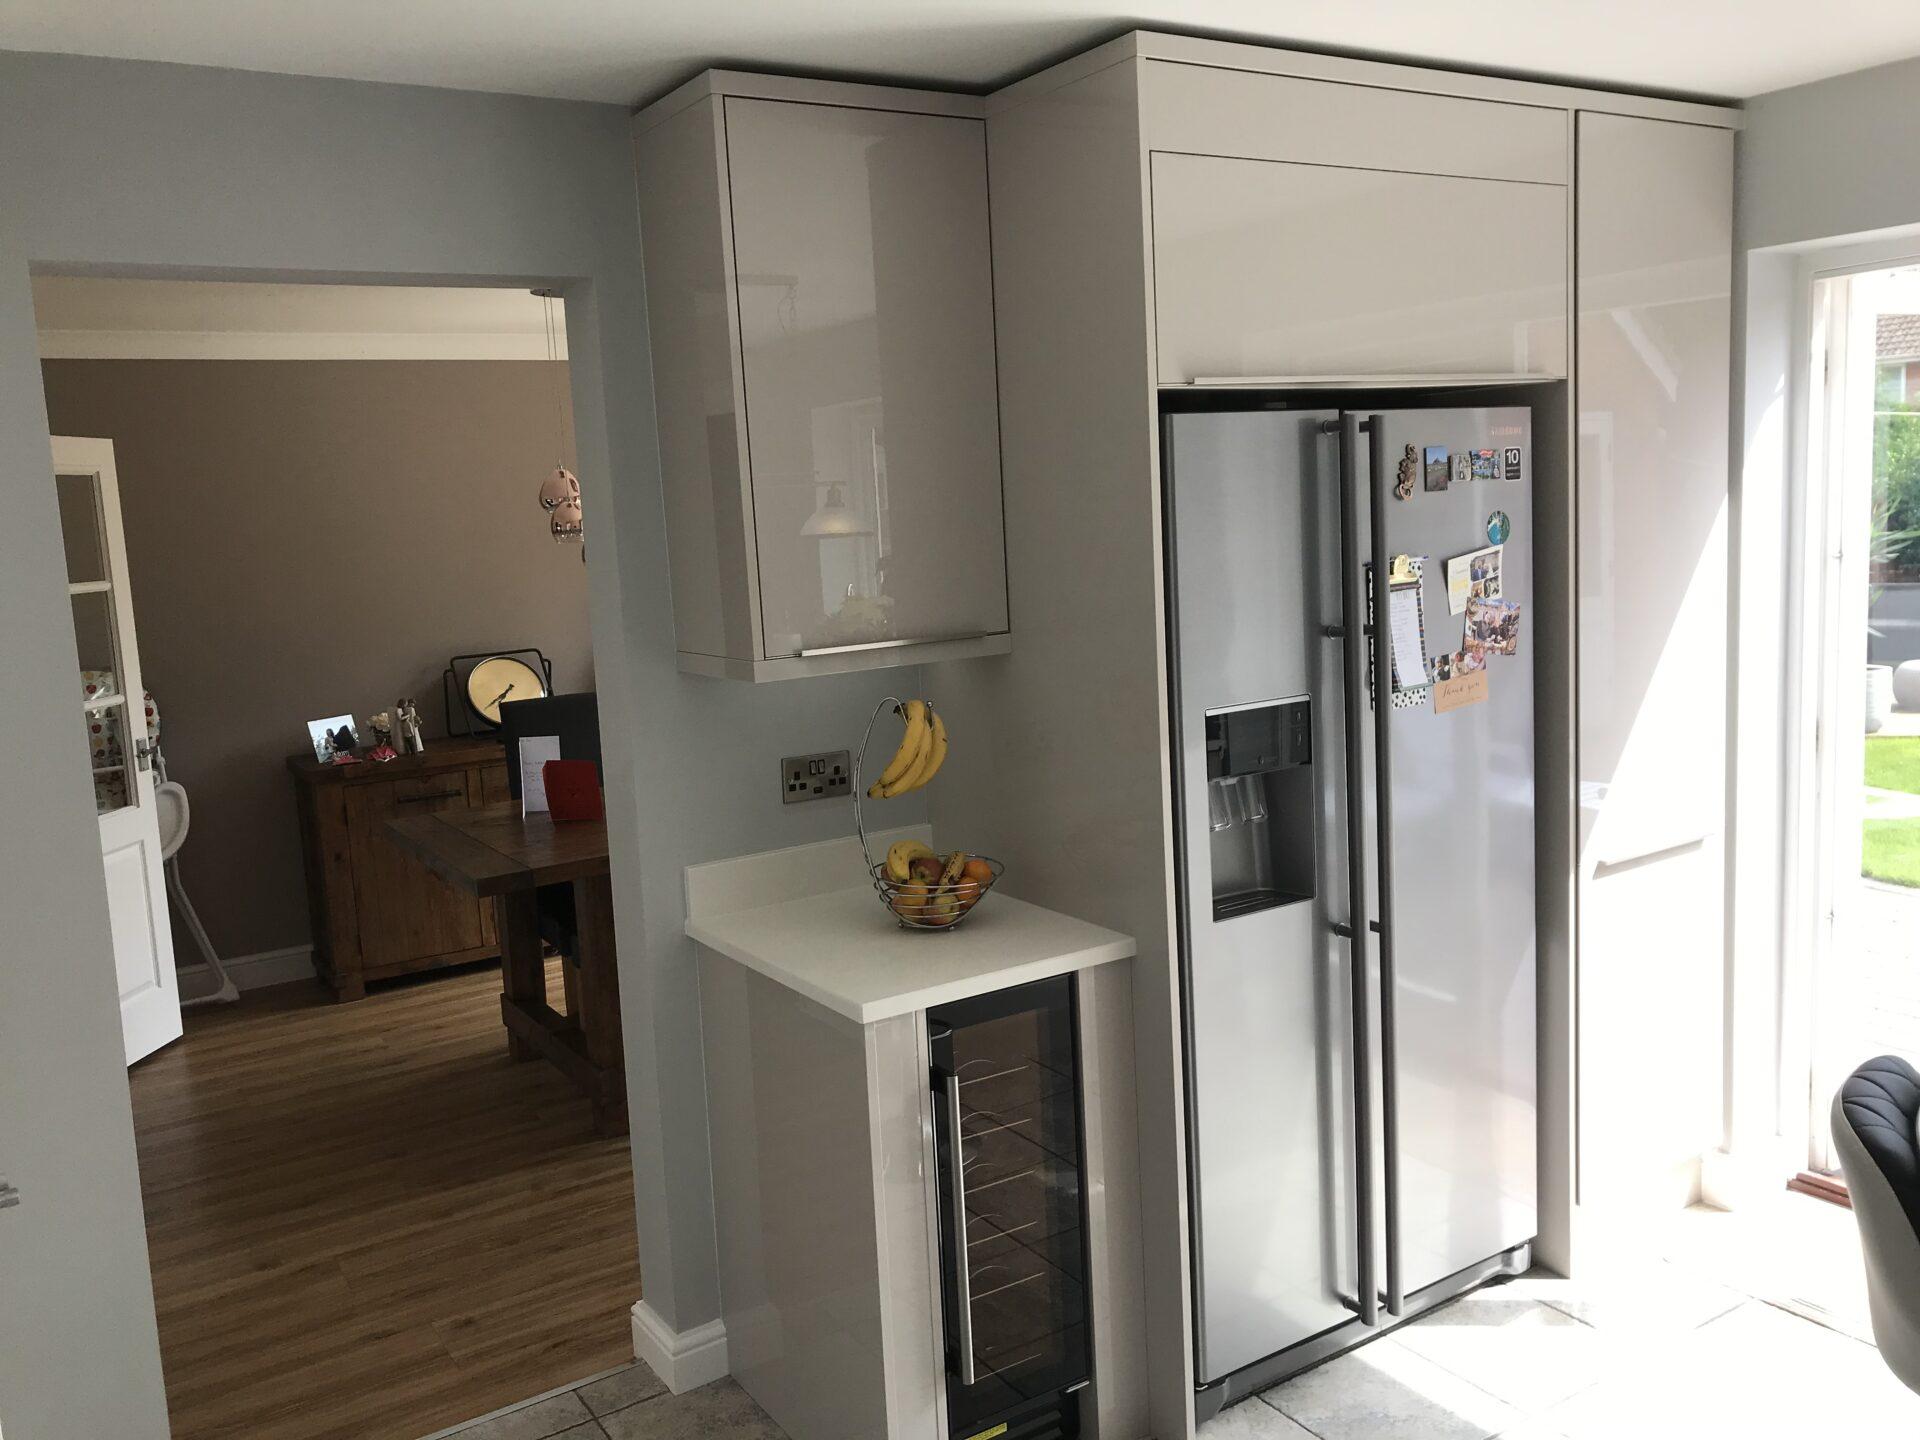 Ultra Gloss Cashmere Kitchen with American Fridge Freezer configuration